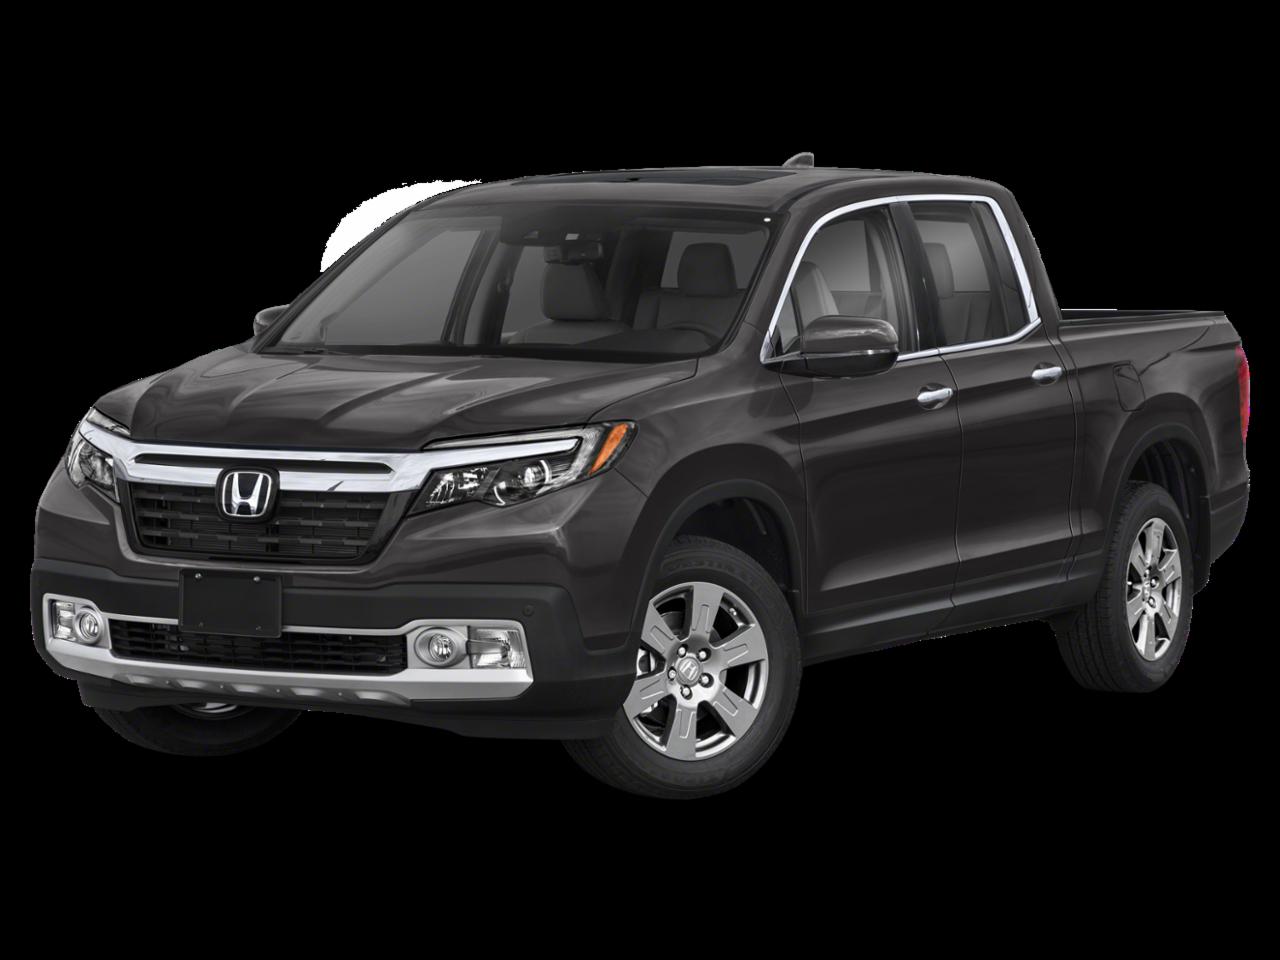 Honda 2020 Ridgeline RTL-E